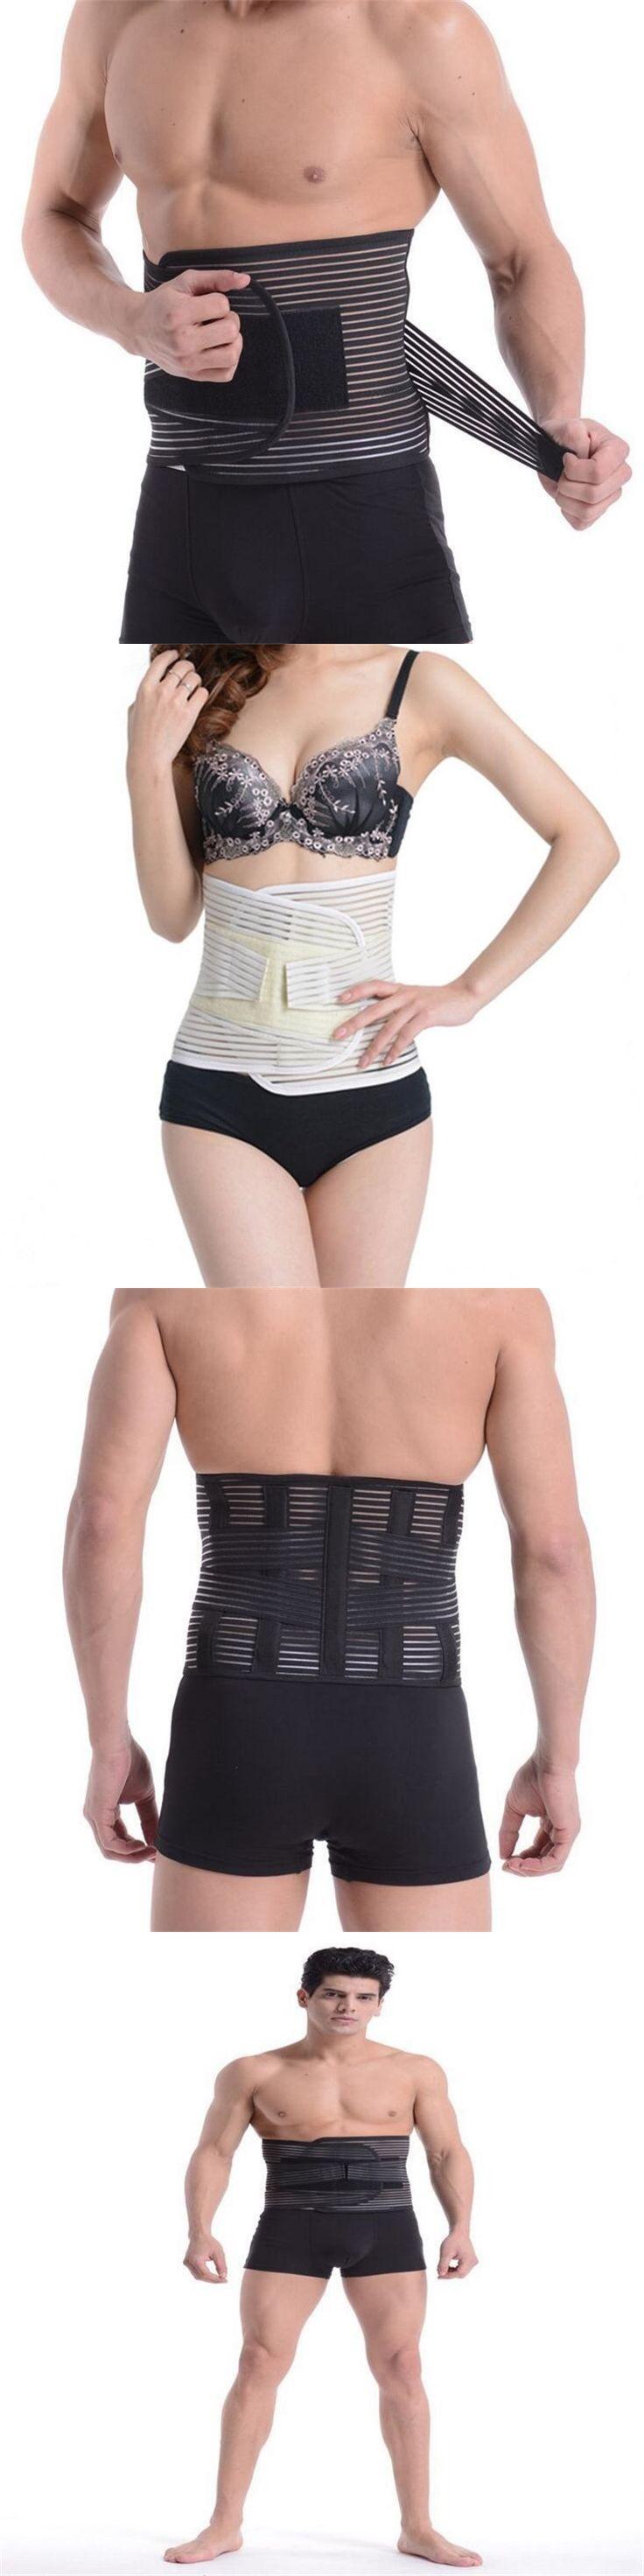 Orthopedic Corset Back Support Belt Men Back Brace Belt Fajas Lumbares Ortopedicas Spine Support Belt Large Size XXL B13